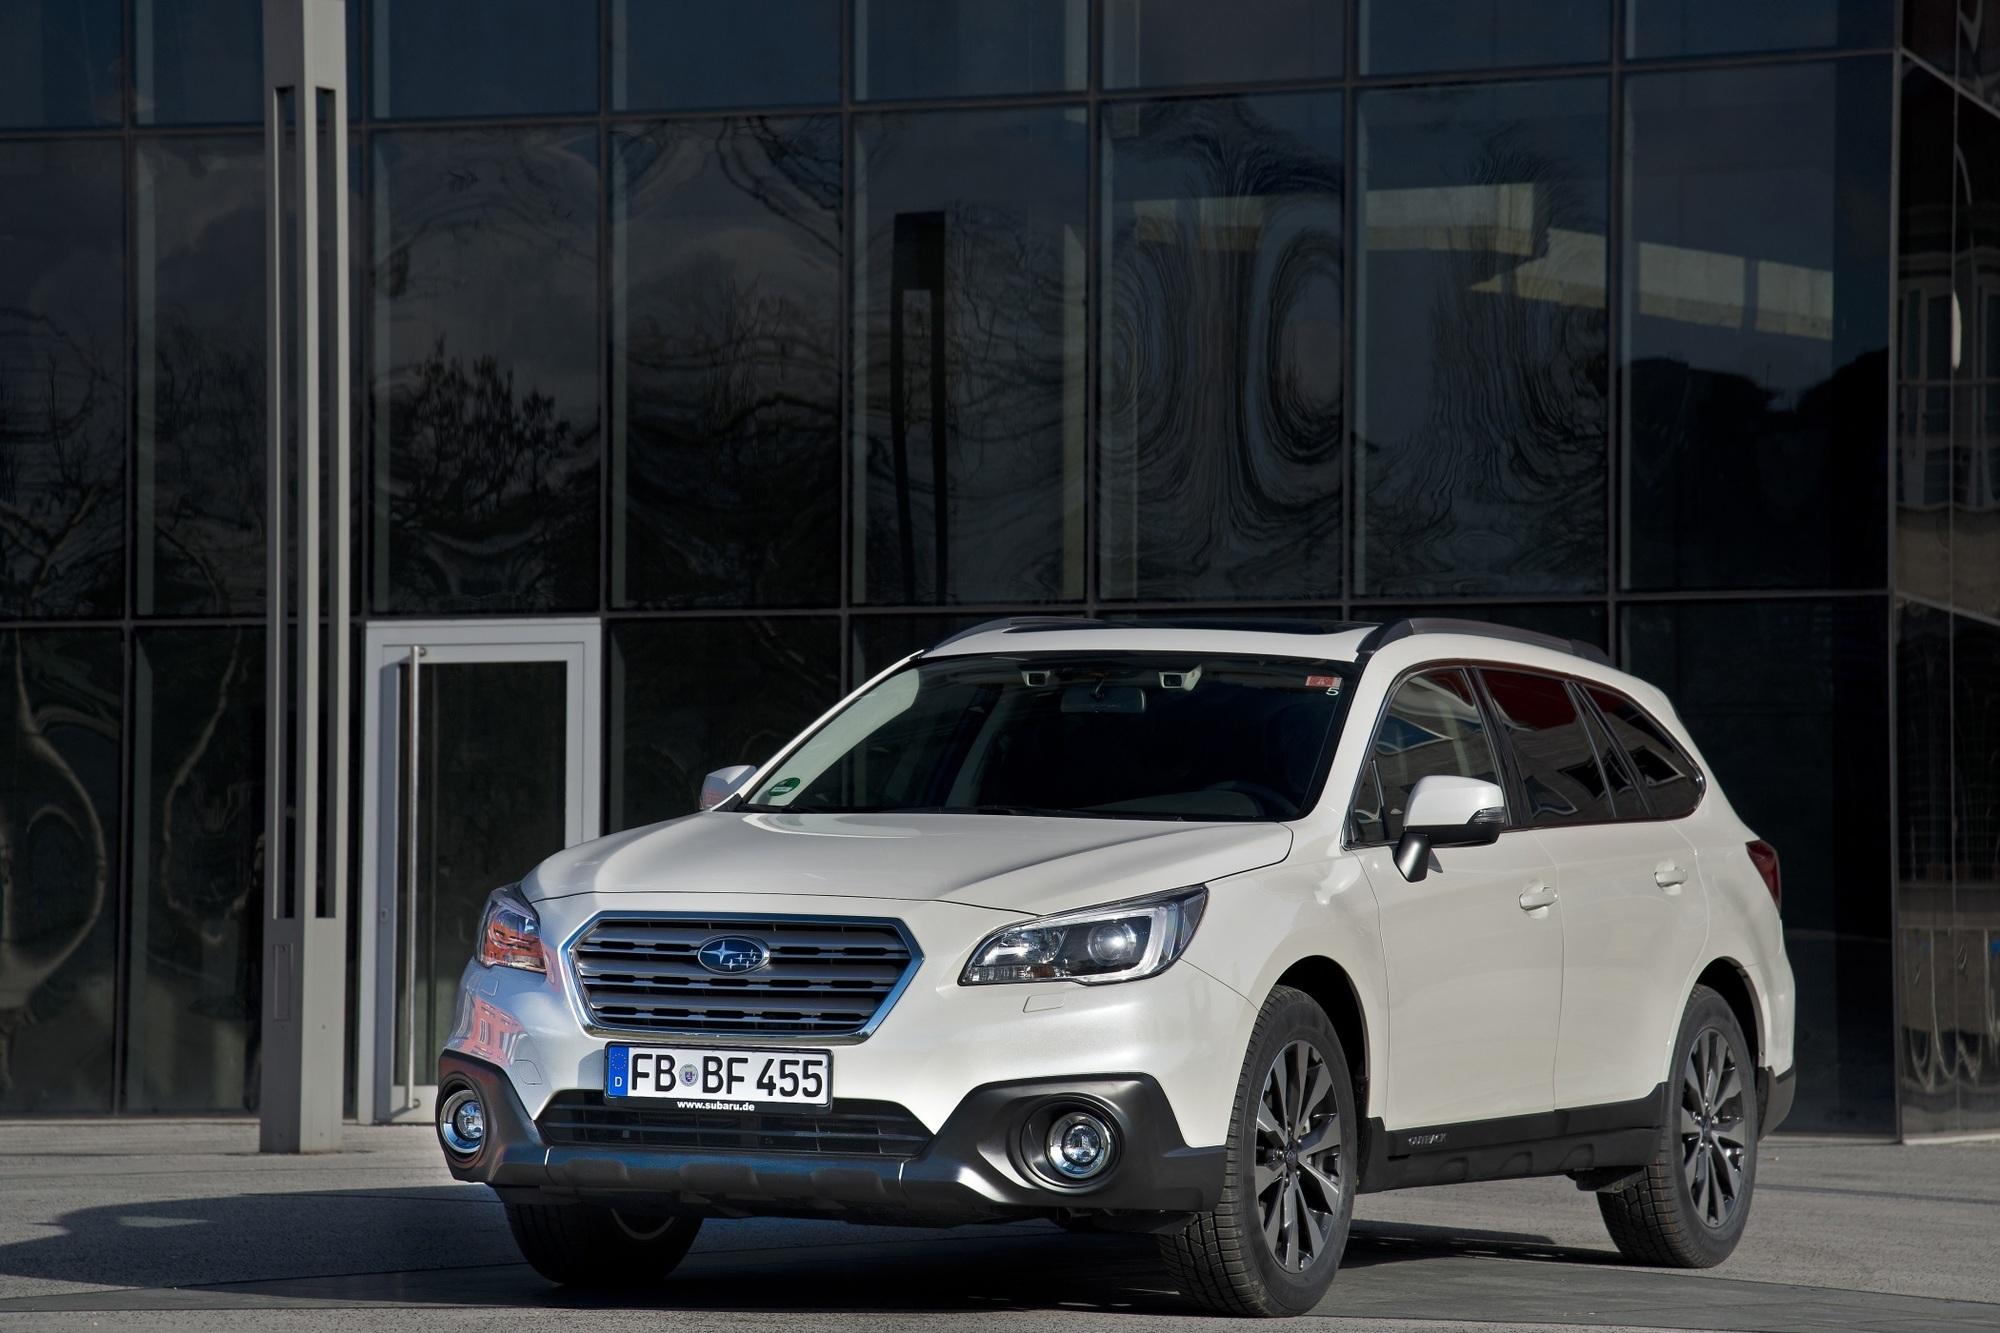 Fahrbericht: Subaru Outback - Souveräner Individualismus